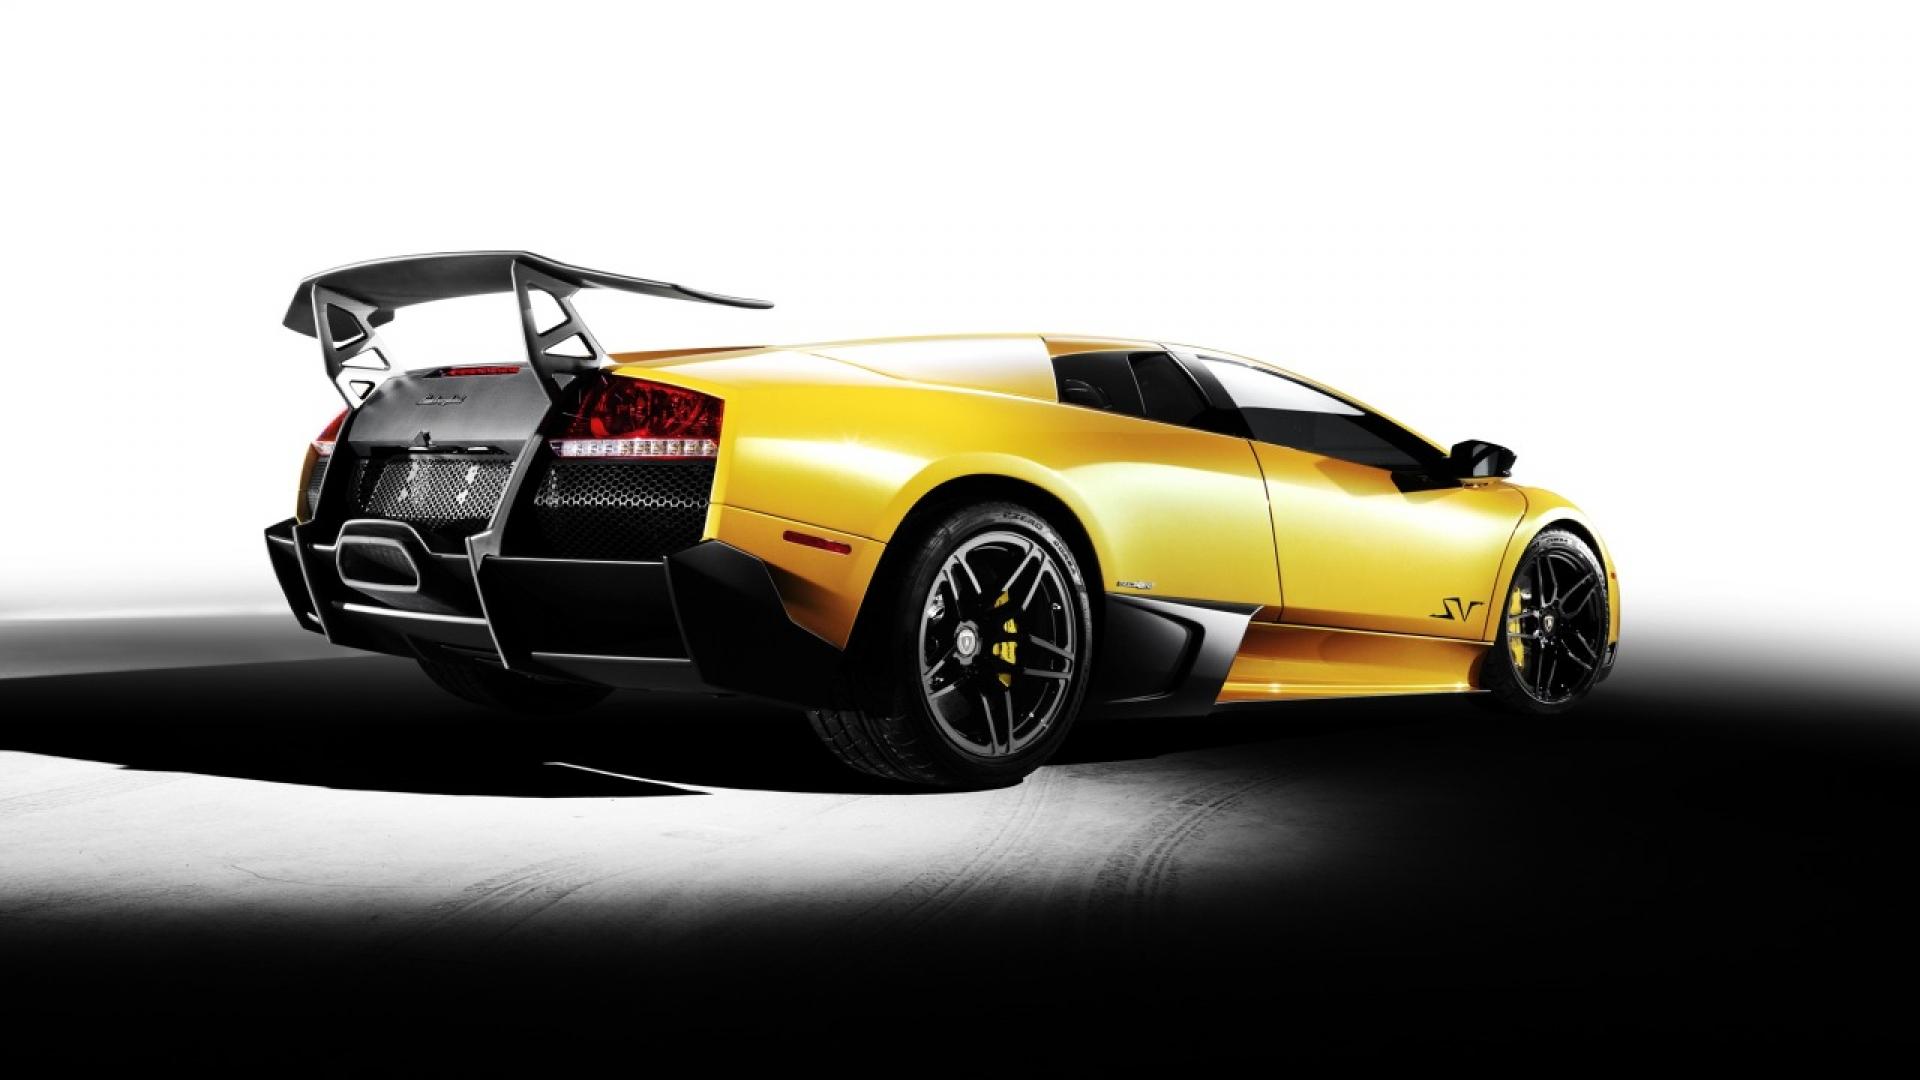 Lamborghini Superveloce Wallpaper